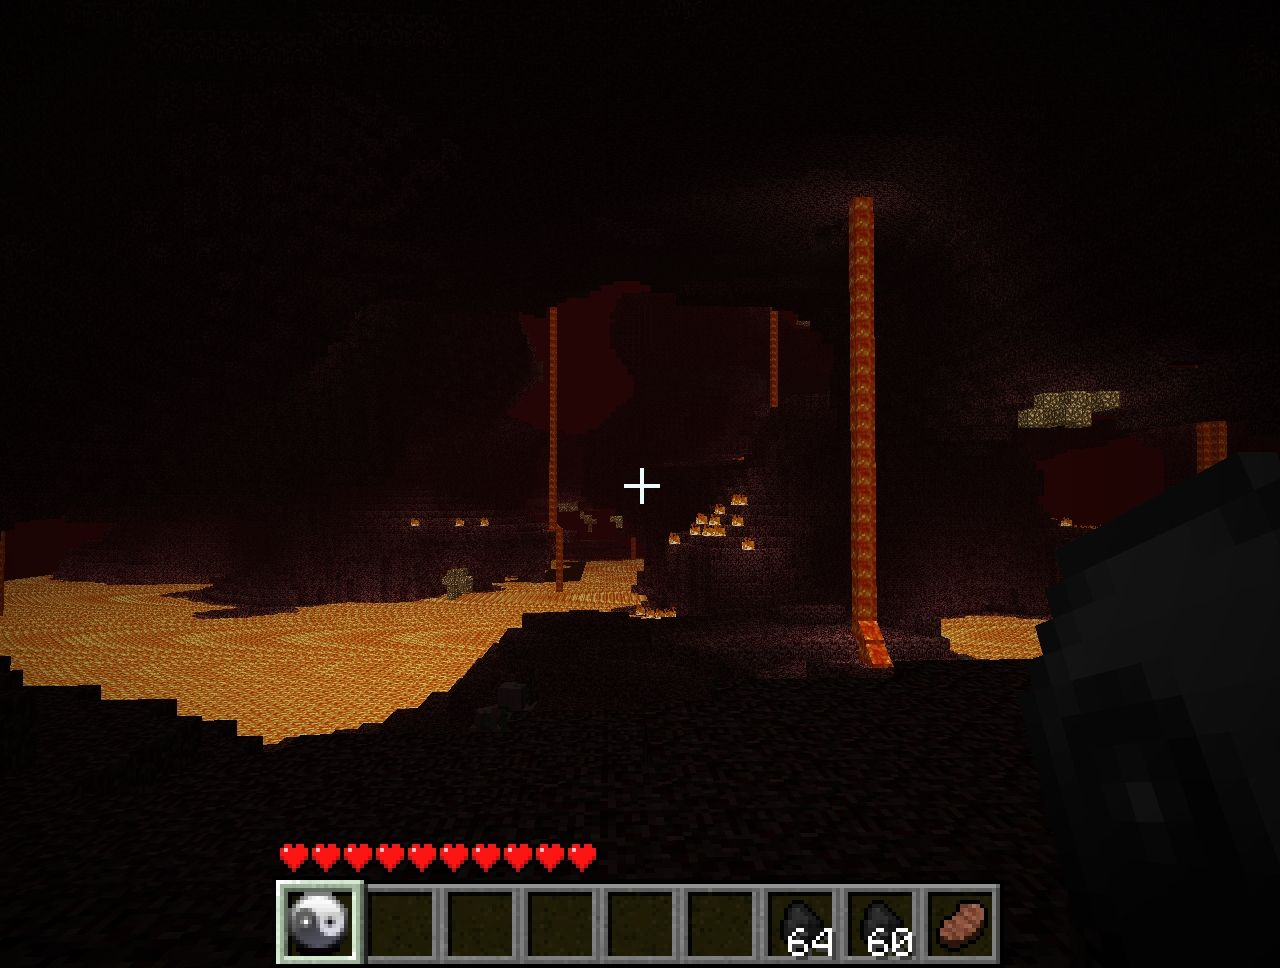 Nether Portal Key Minecraft Mod